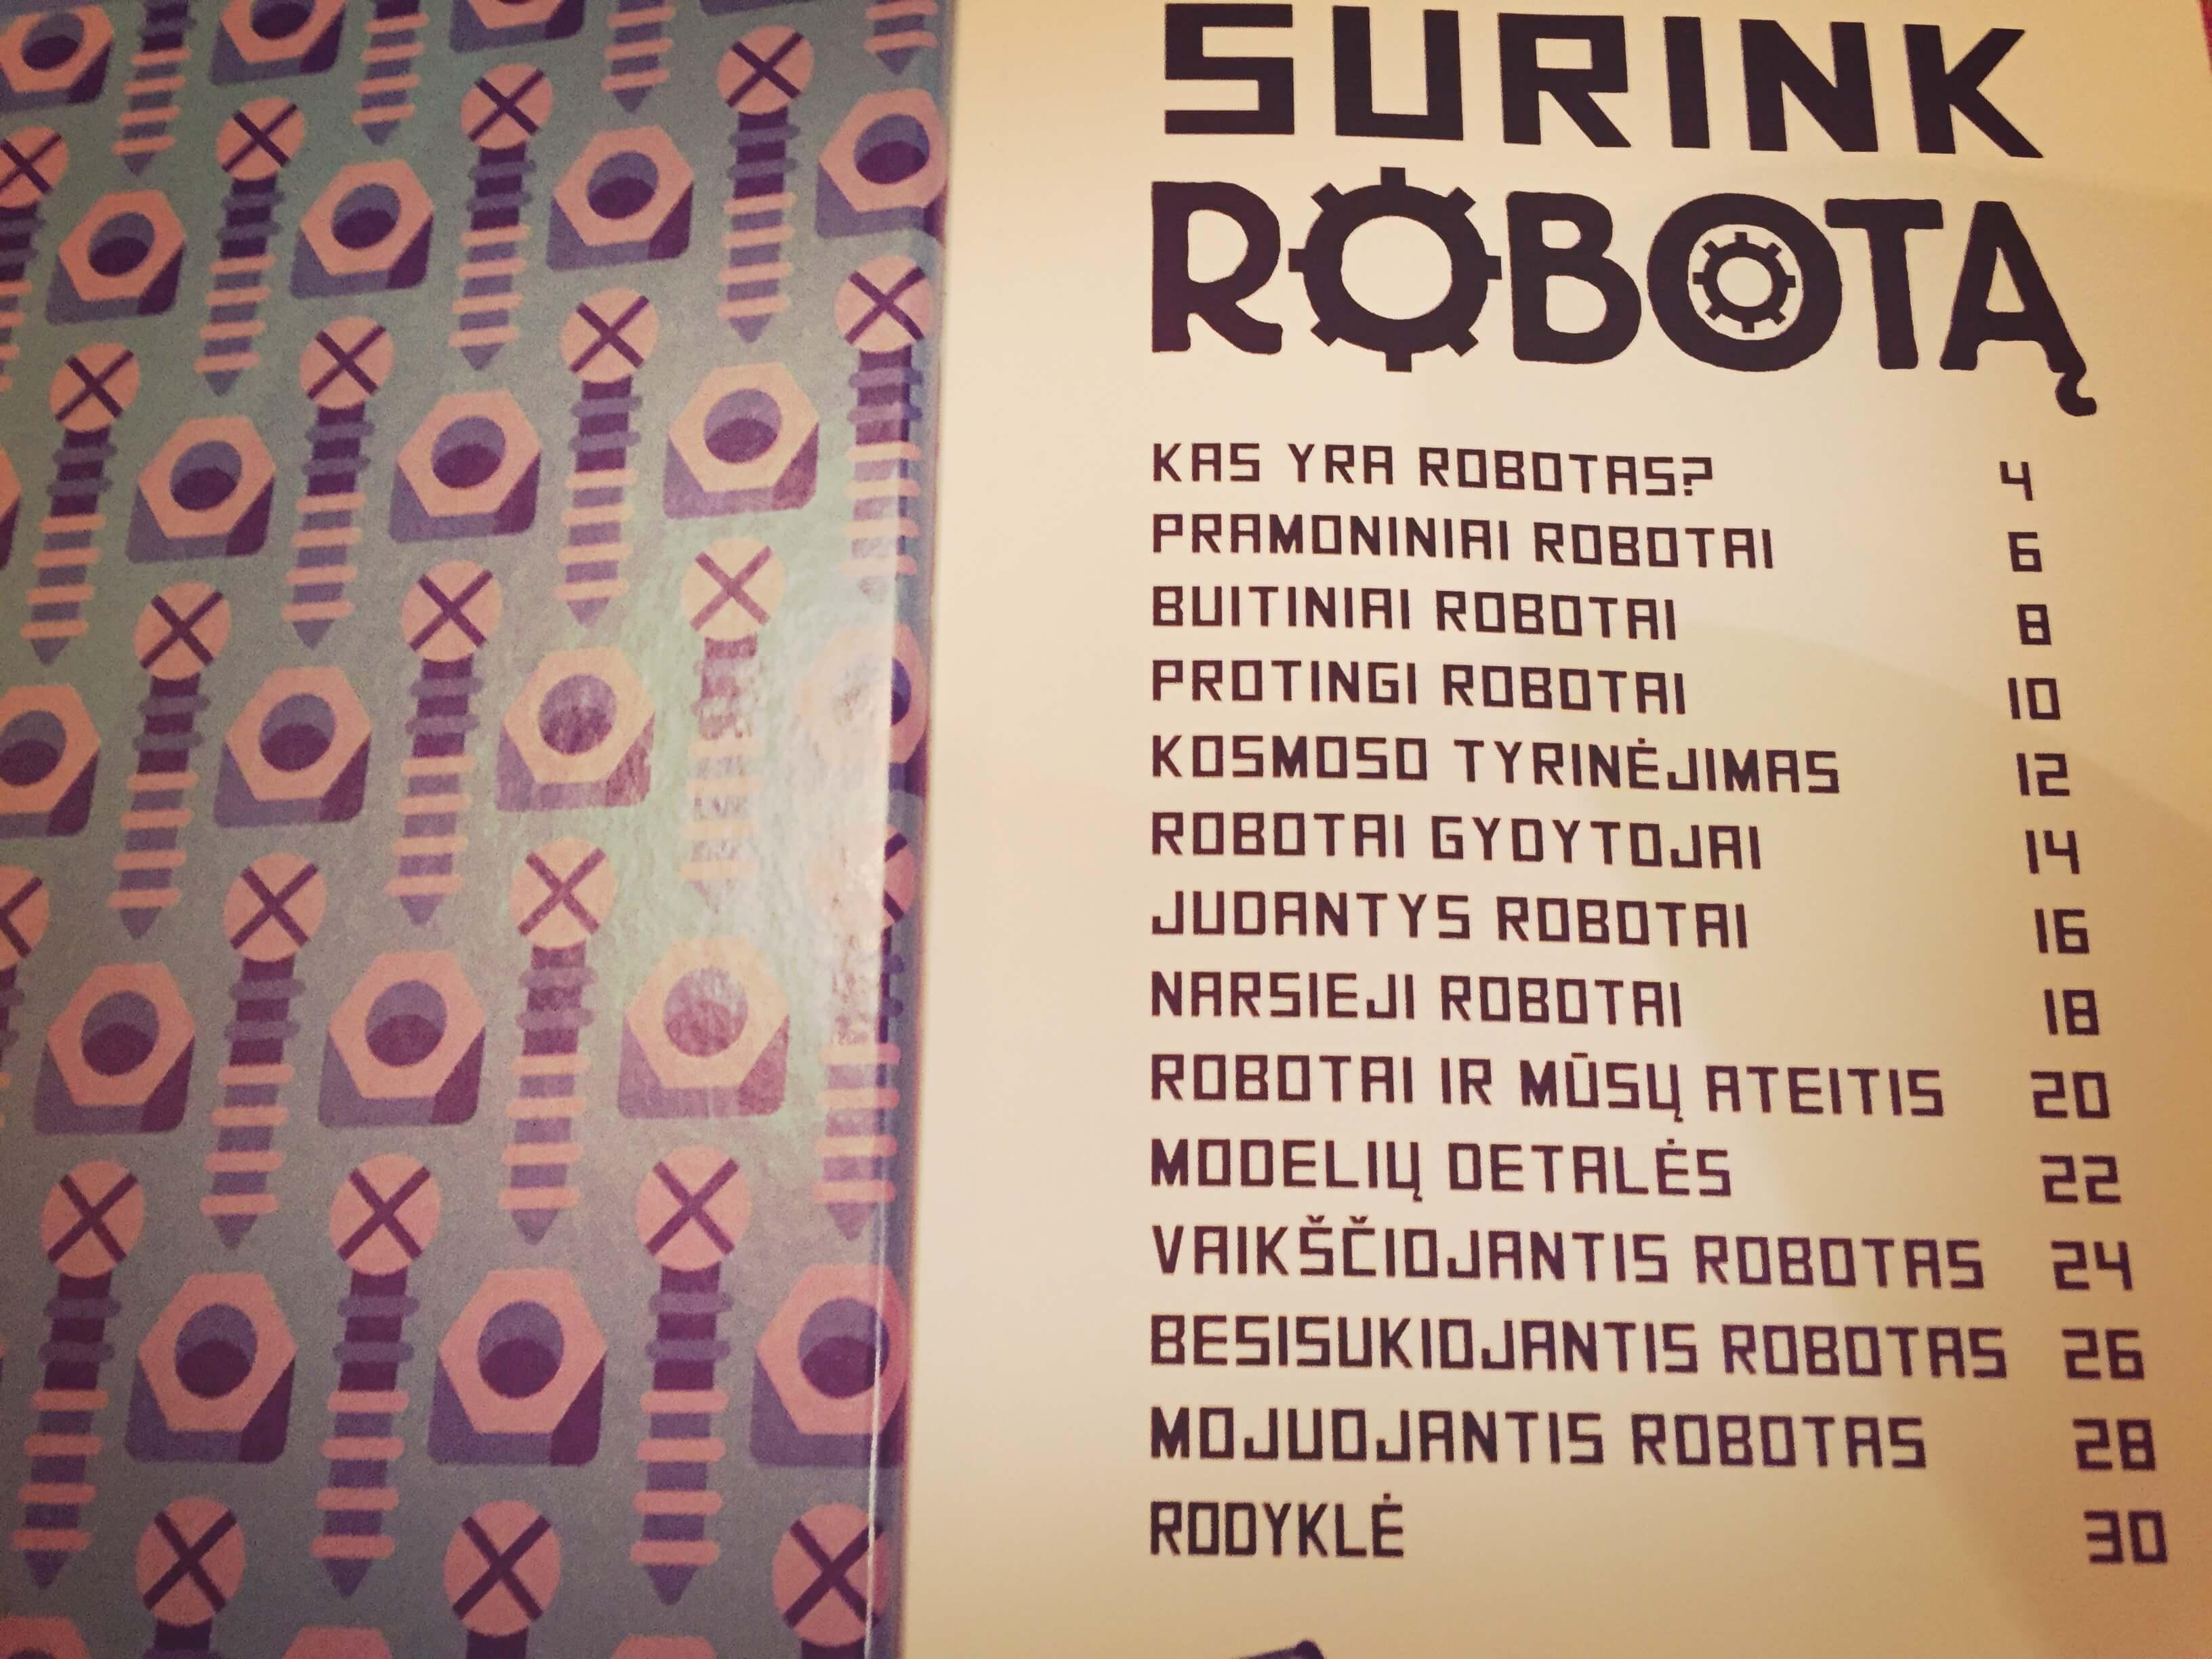 Surink robotą 7